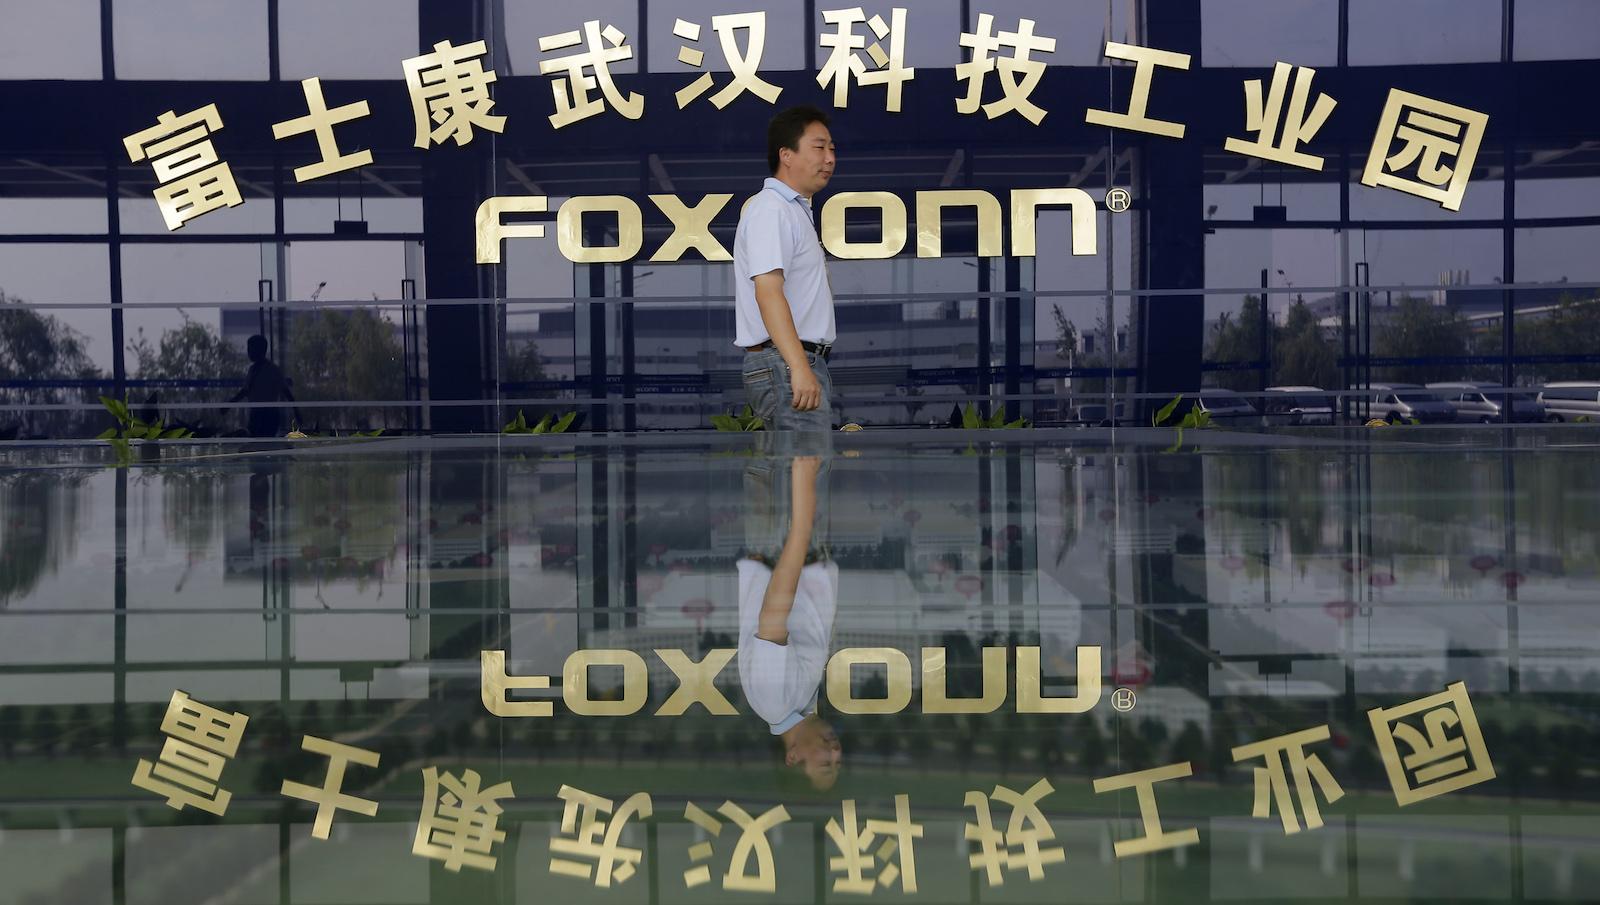 Foxconn-Bharti-SoftBank